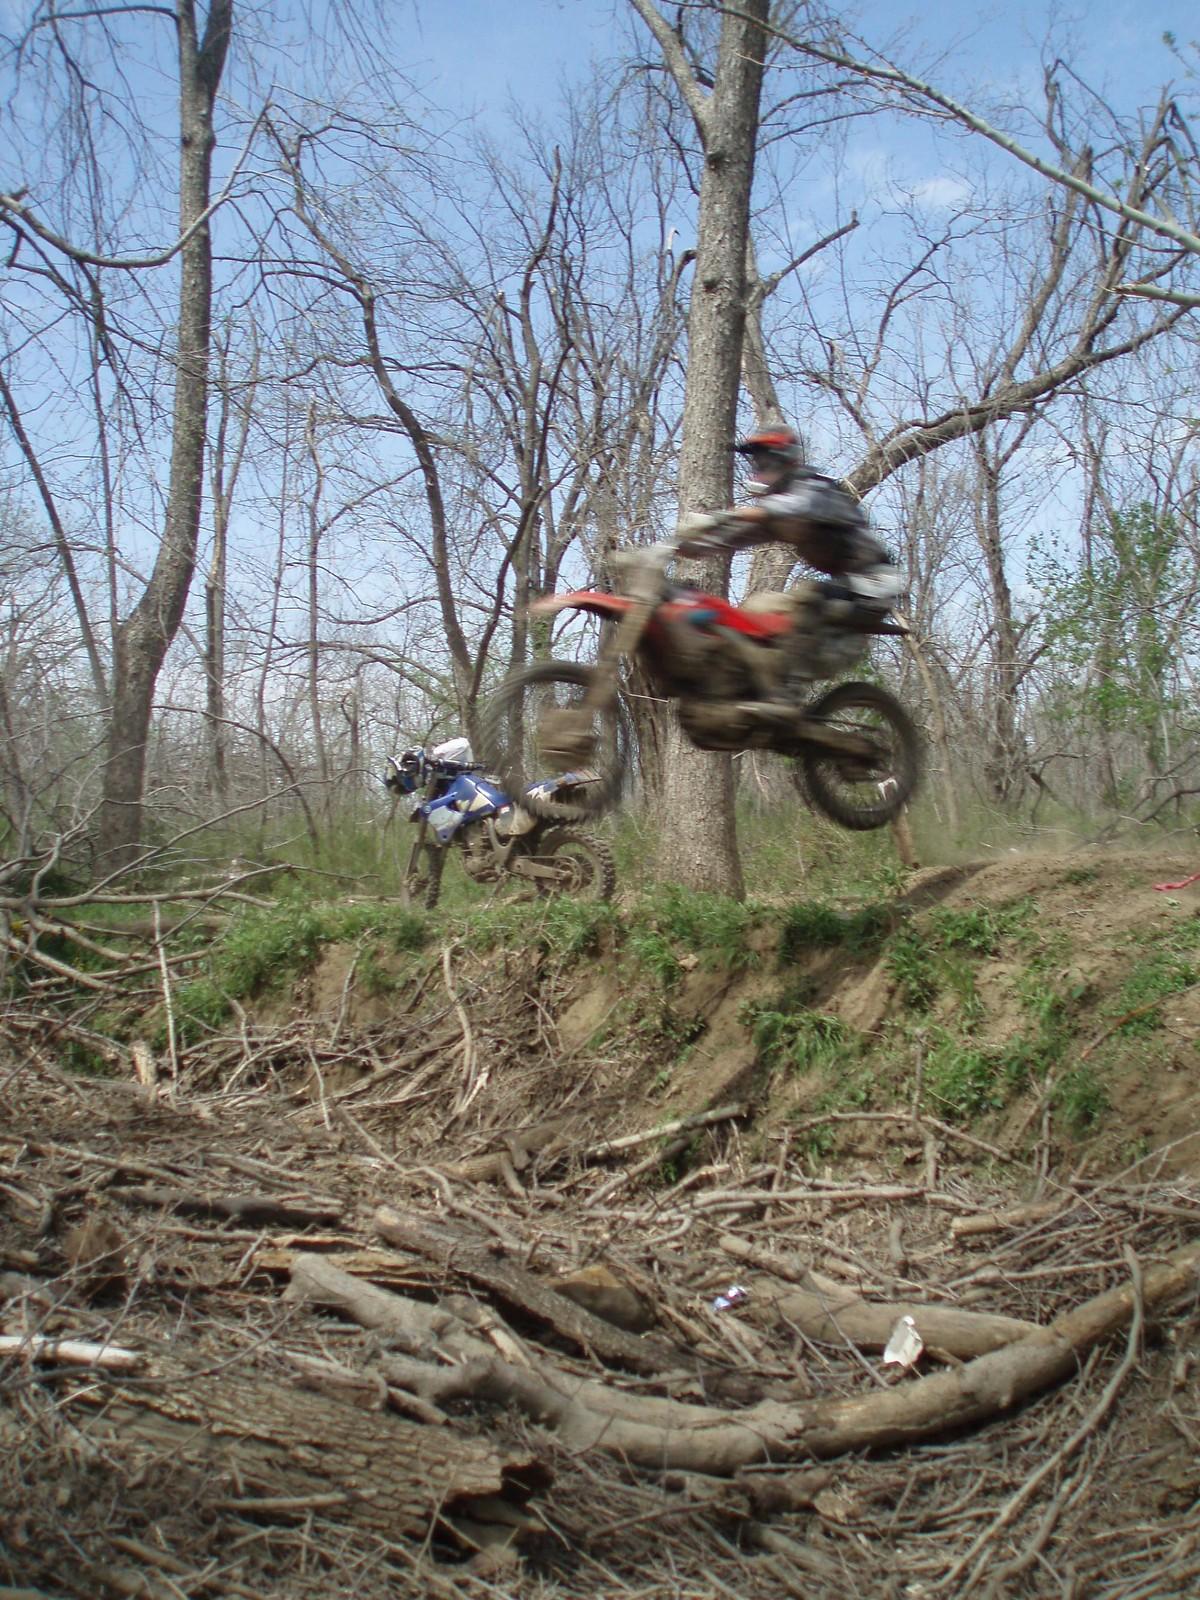 Skiatook Ok Race 08 small creek jump - Slim Bill - Motocross Pictures - Vital MX